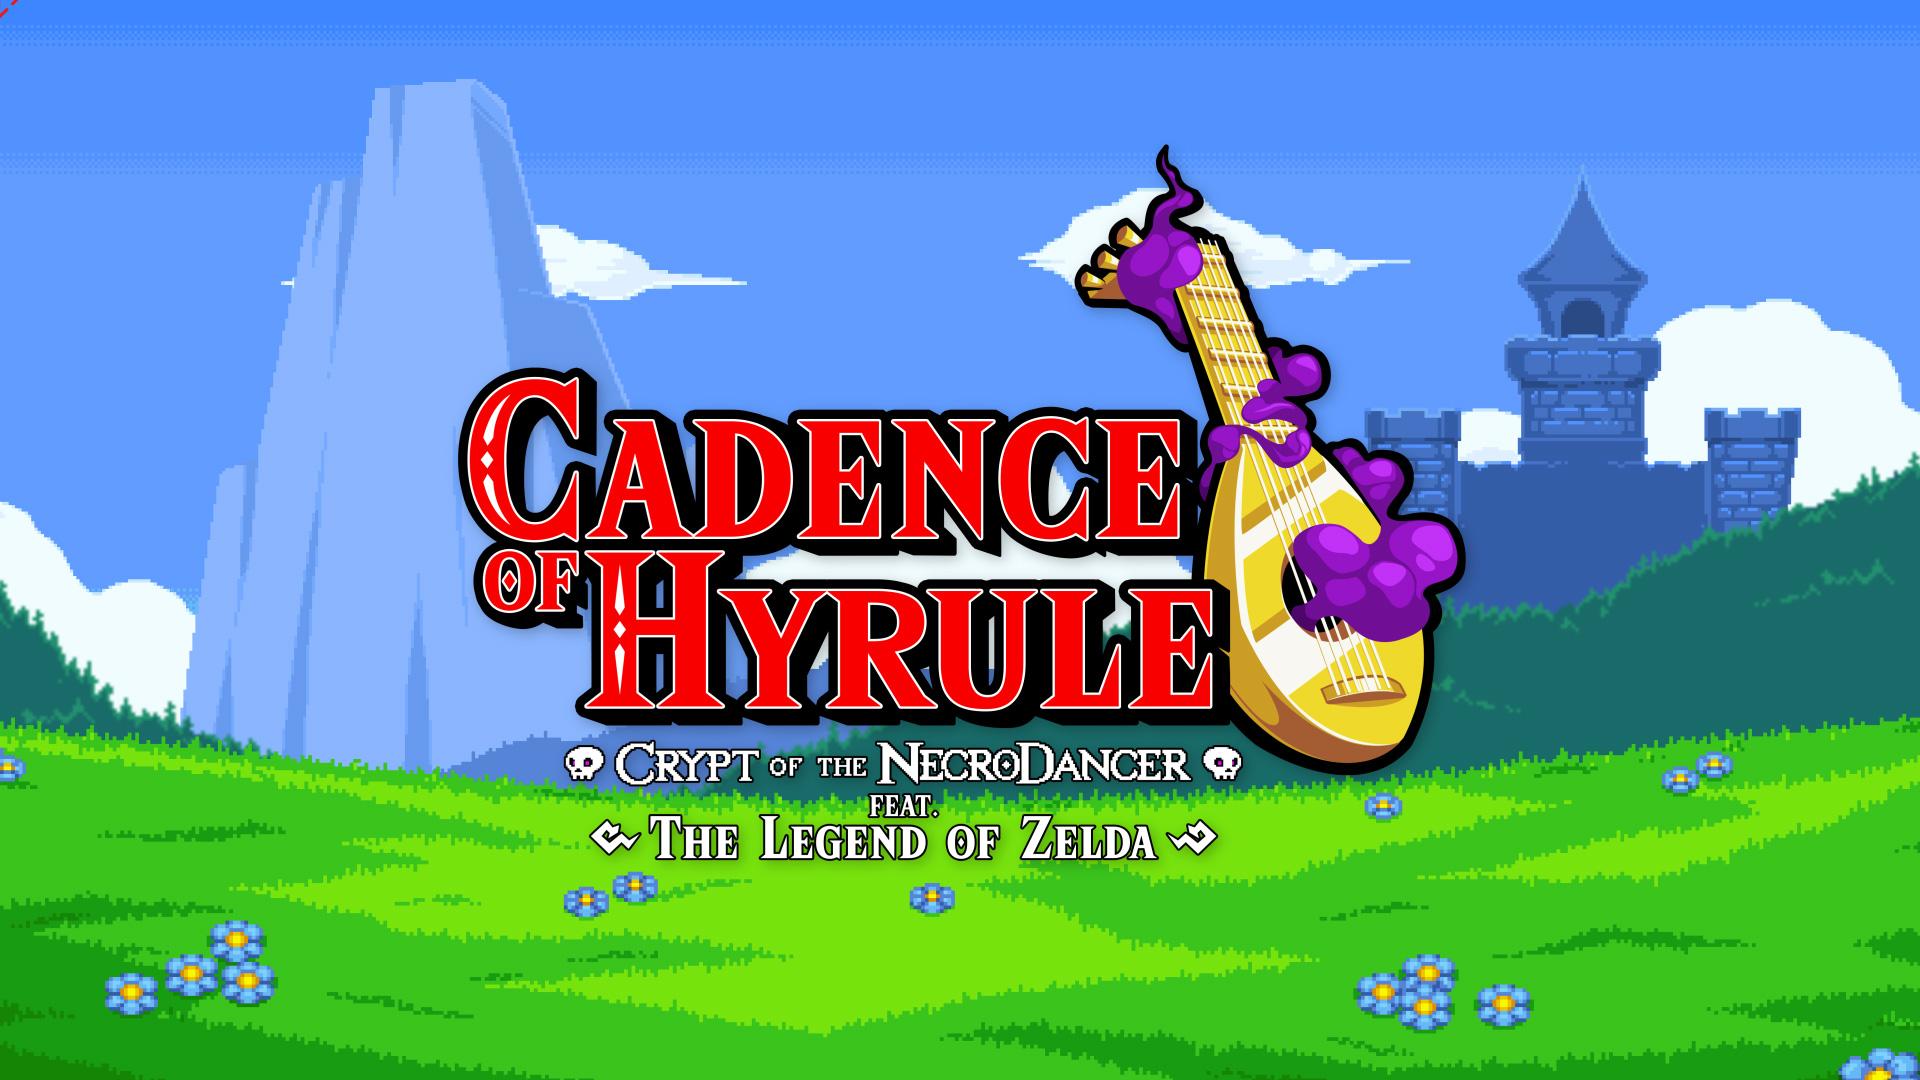 cadence-of-hyrule.jpg